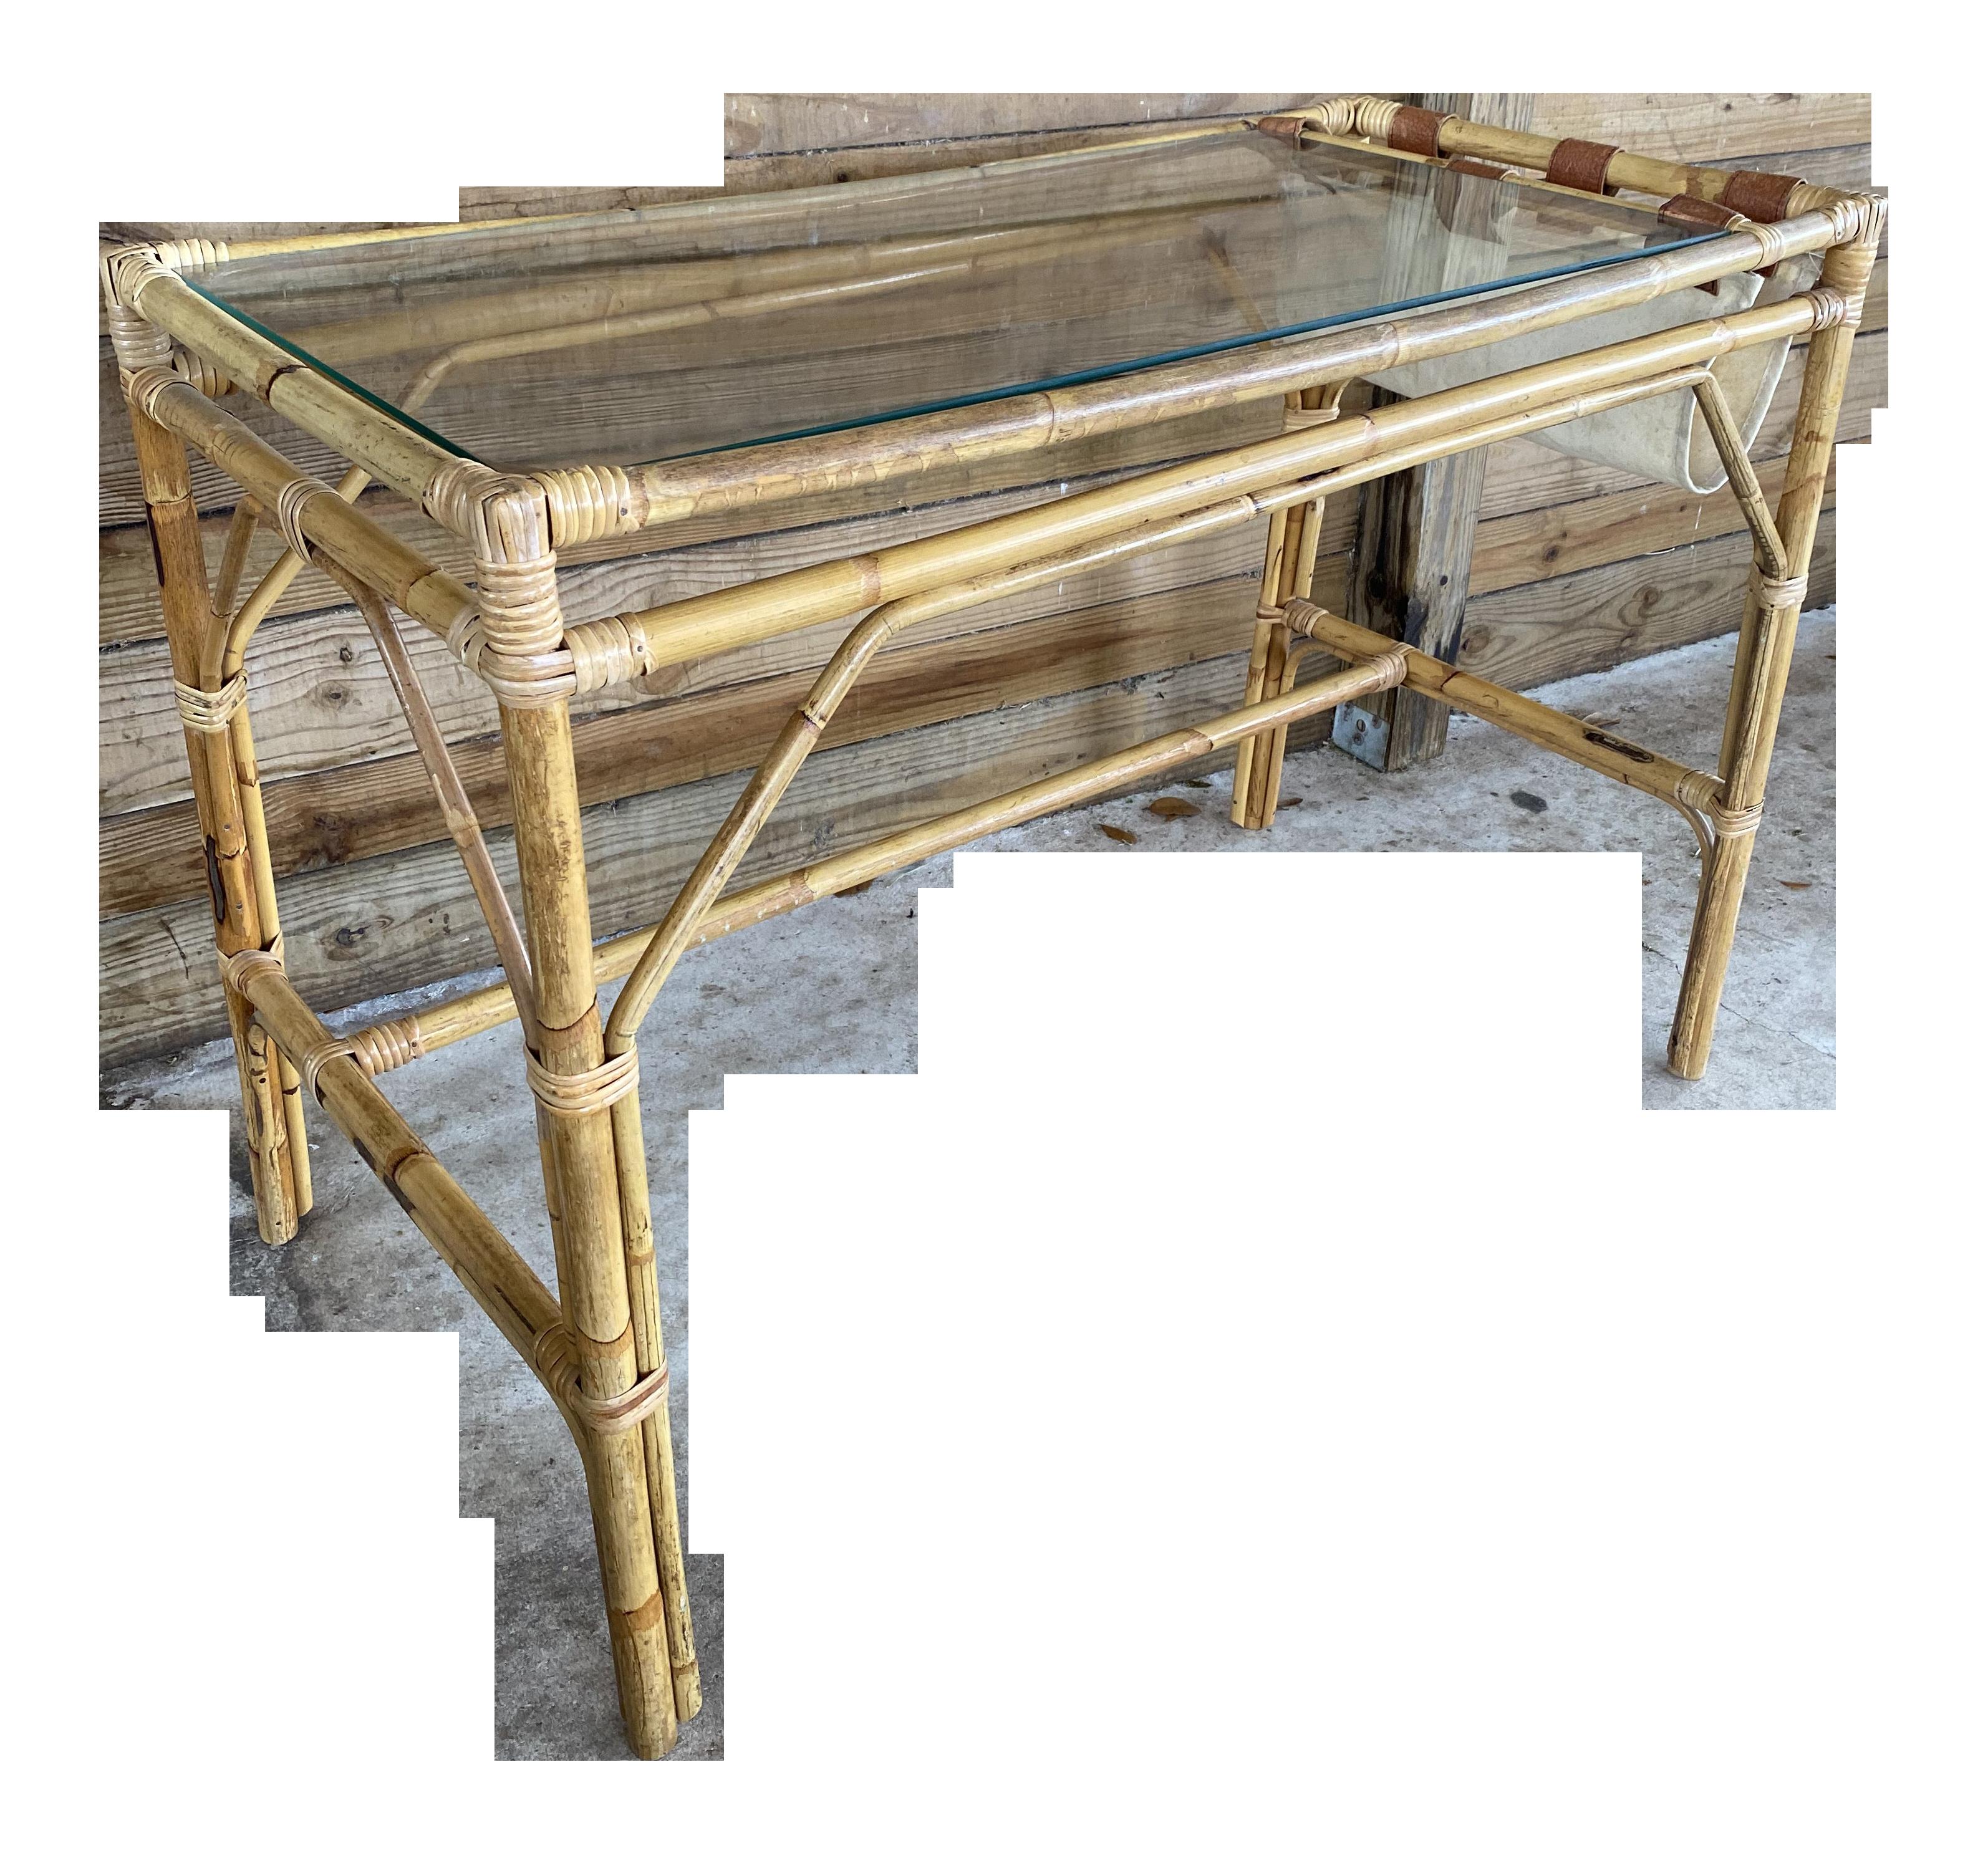 Vintage Coastal Boho Chic Rattan Desk Chairish